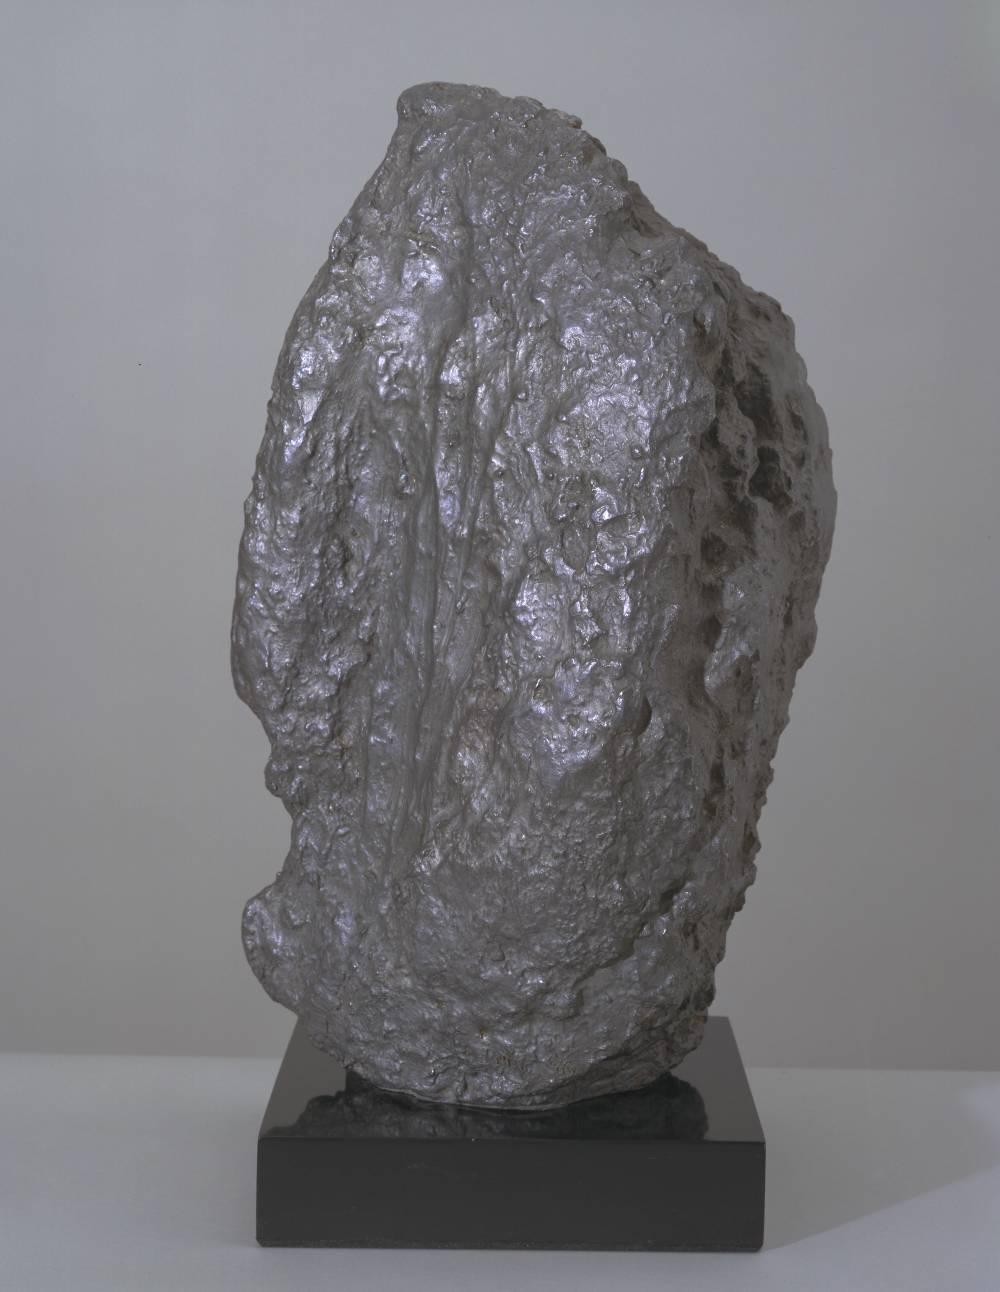 Head of a Hostage 1943-4 by Jean Fautrier 1898-1964